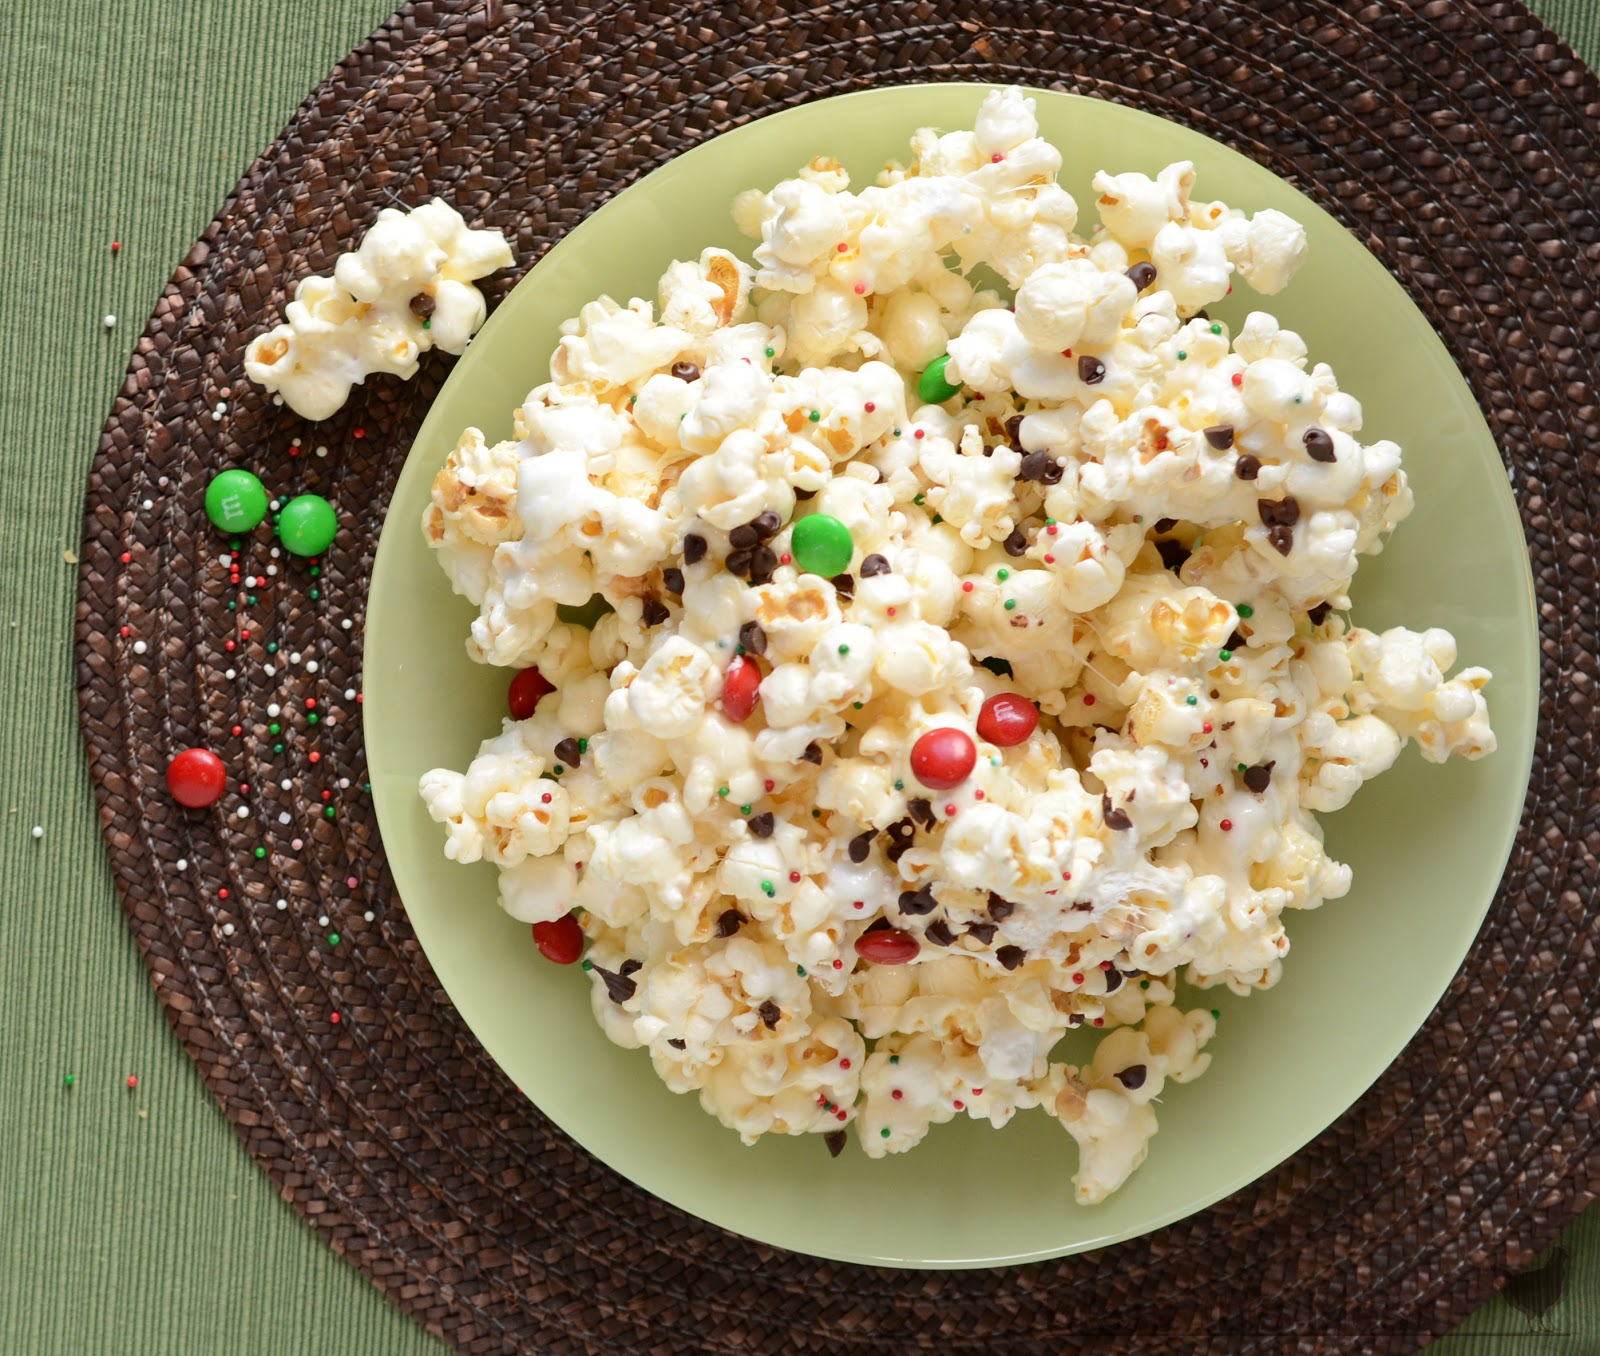 Gooey Marshmallow Christmas Popcorn With Chocolate